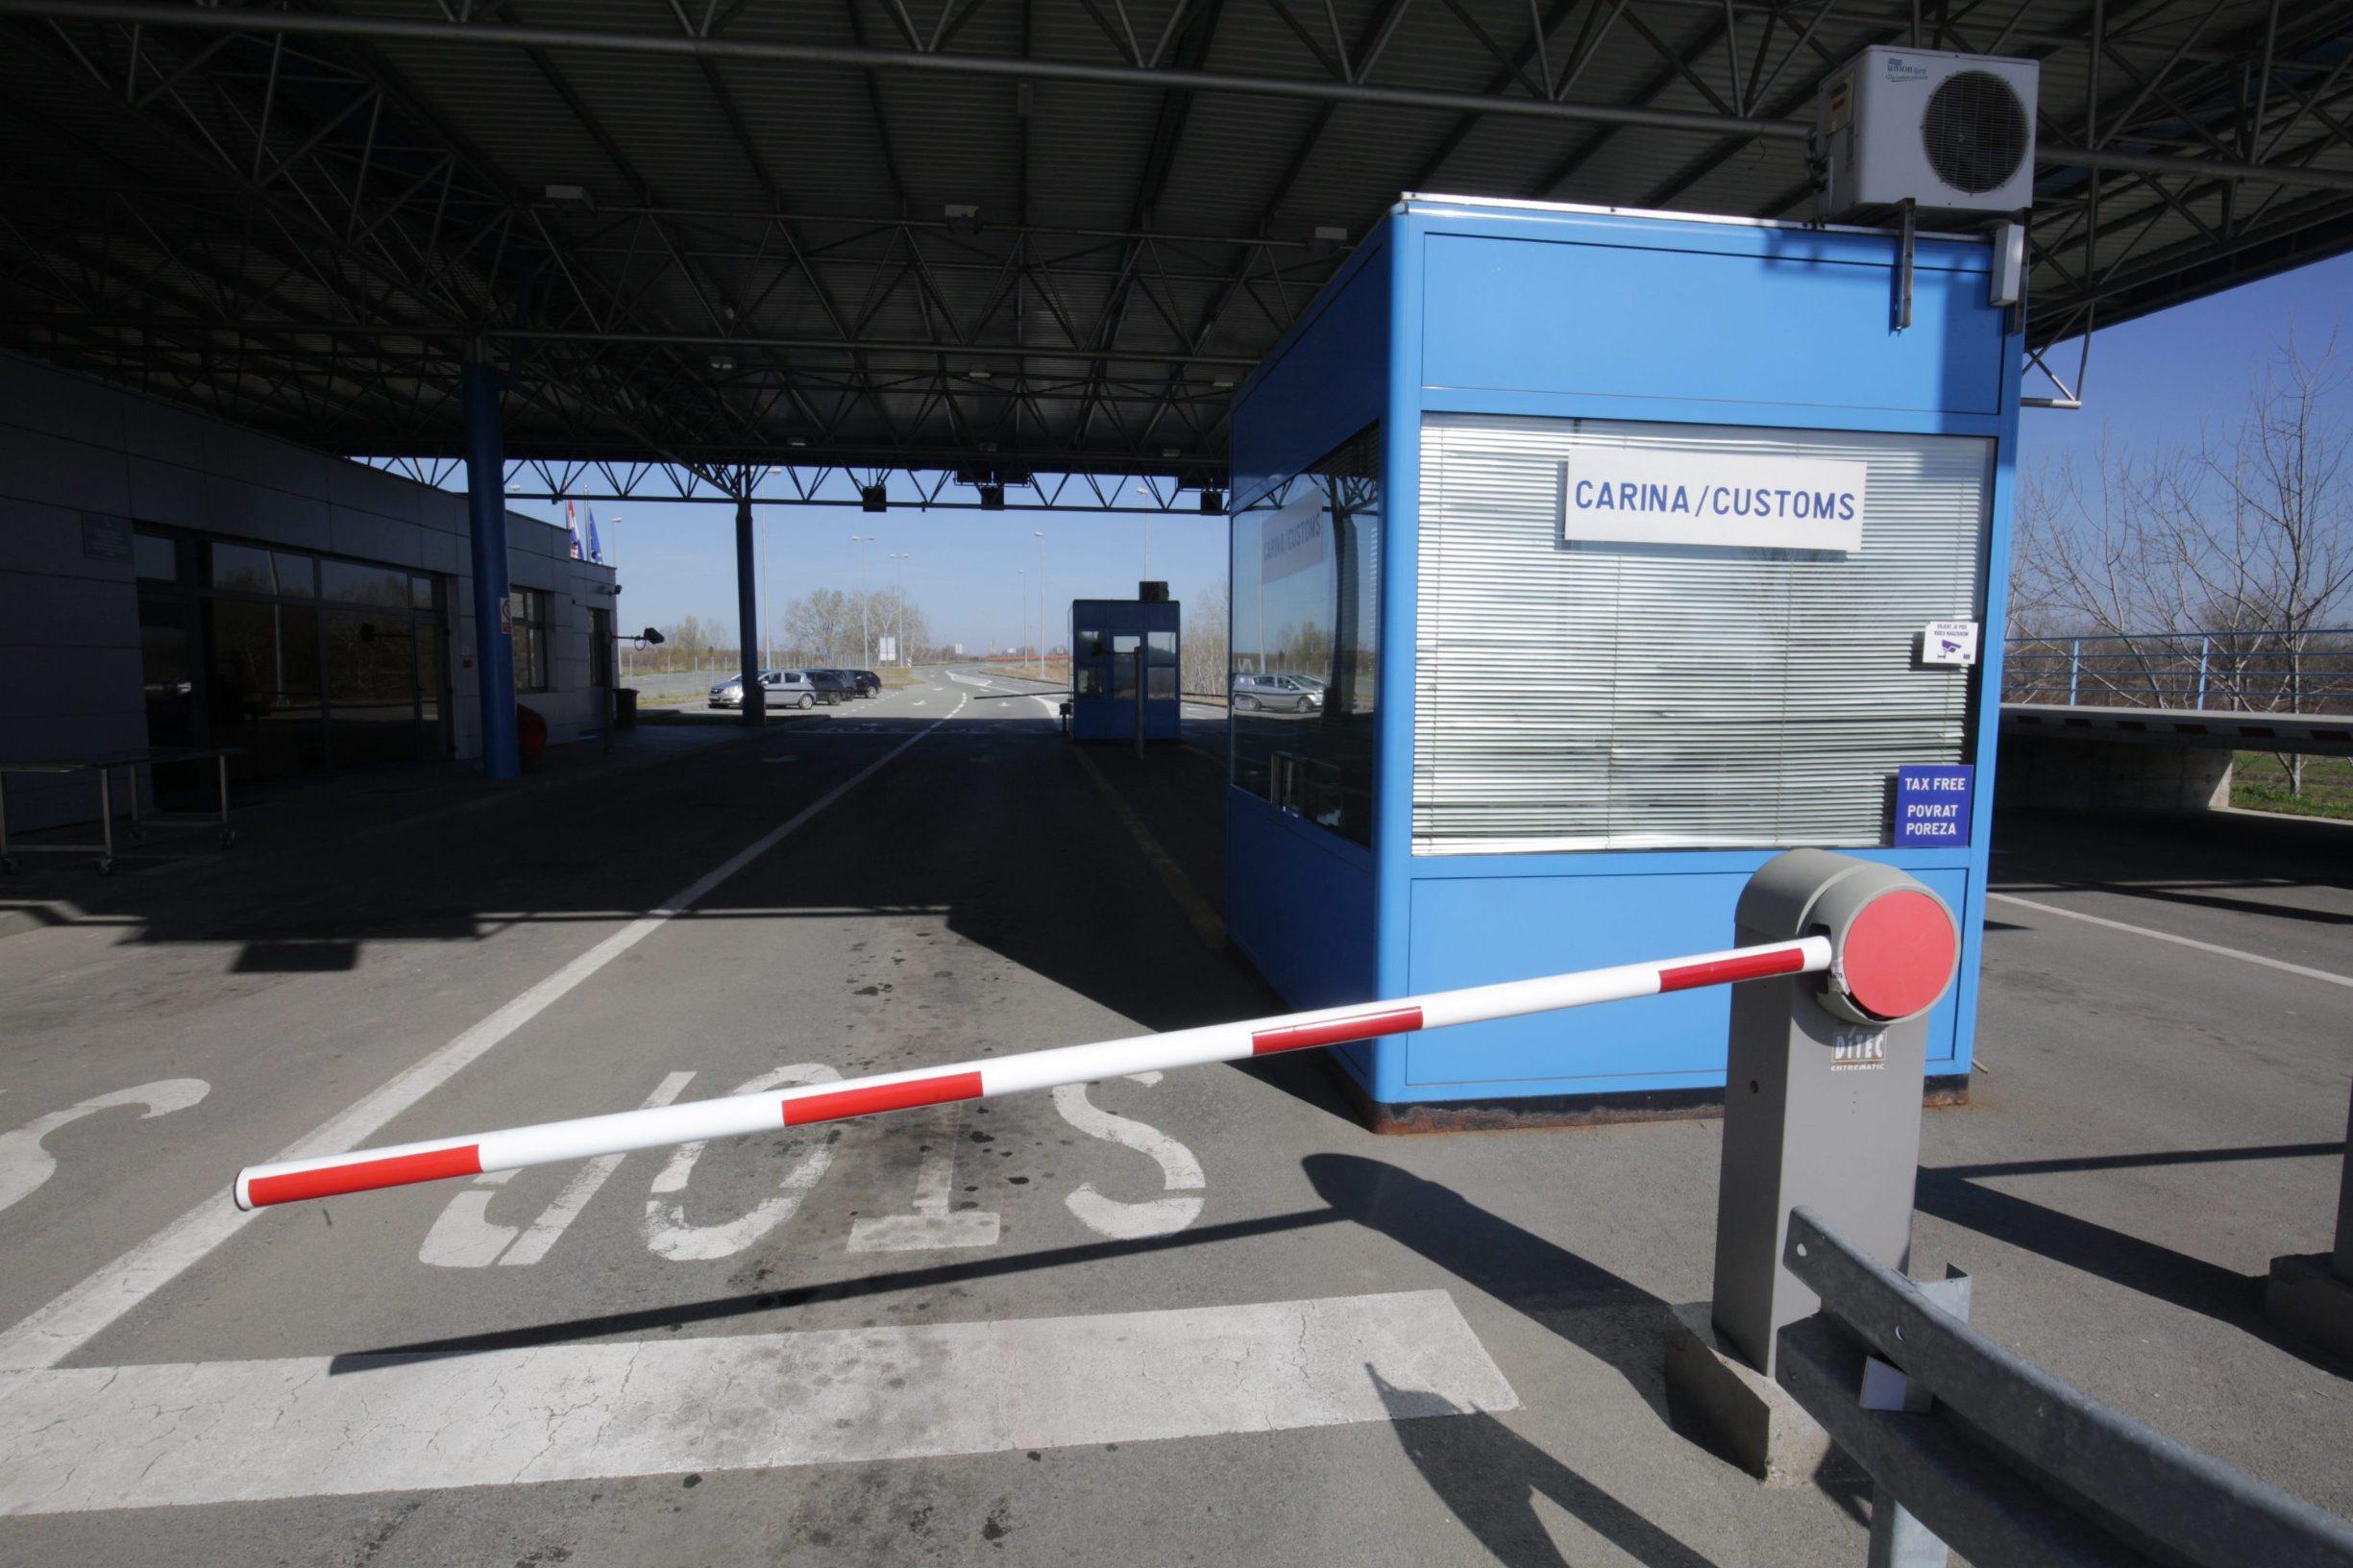 Croatian-Serbian border has been closed due to the coronavirus epidemic